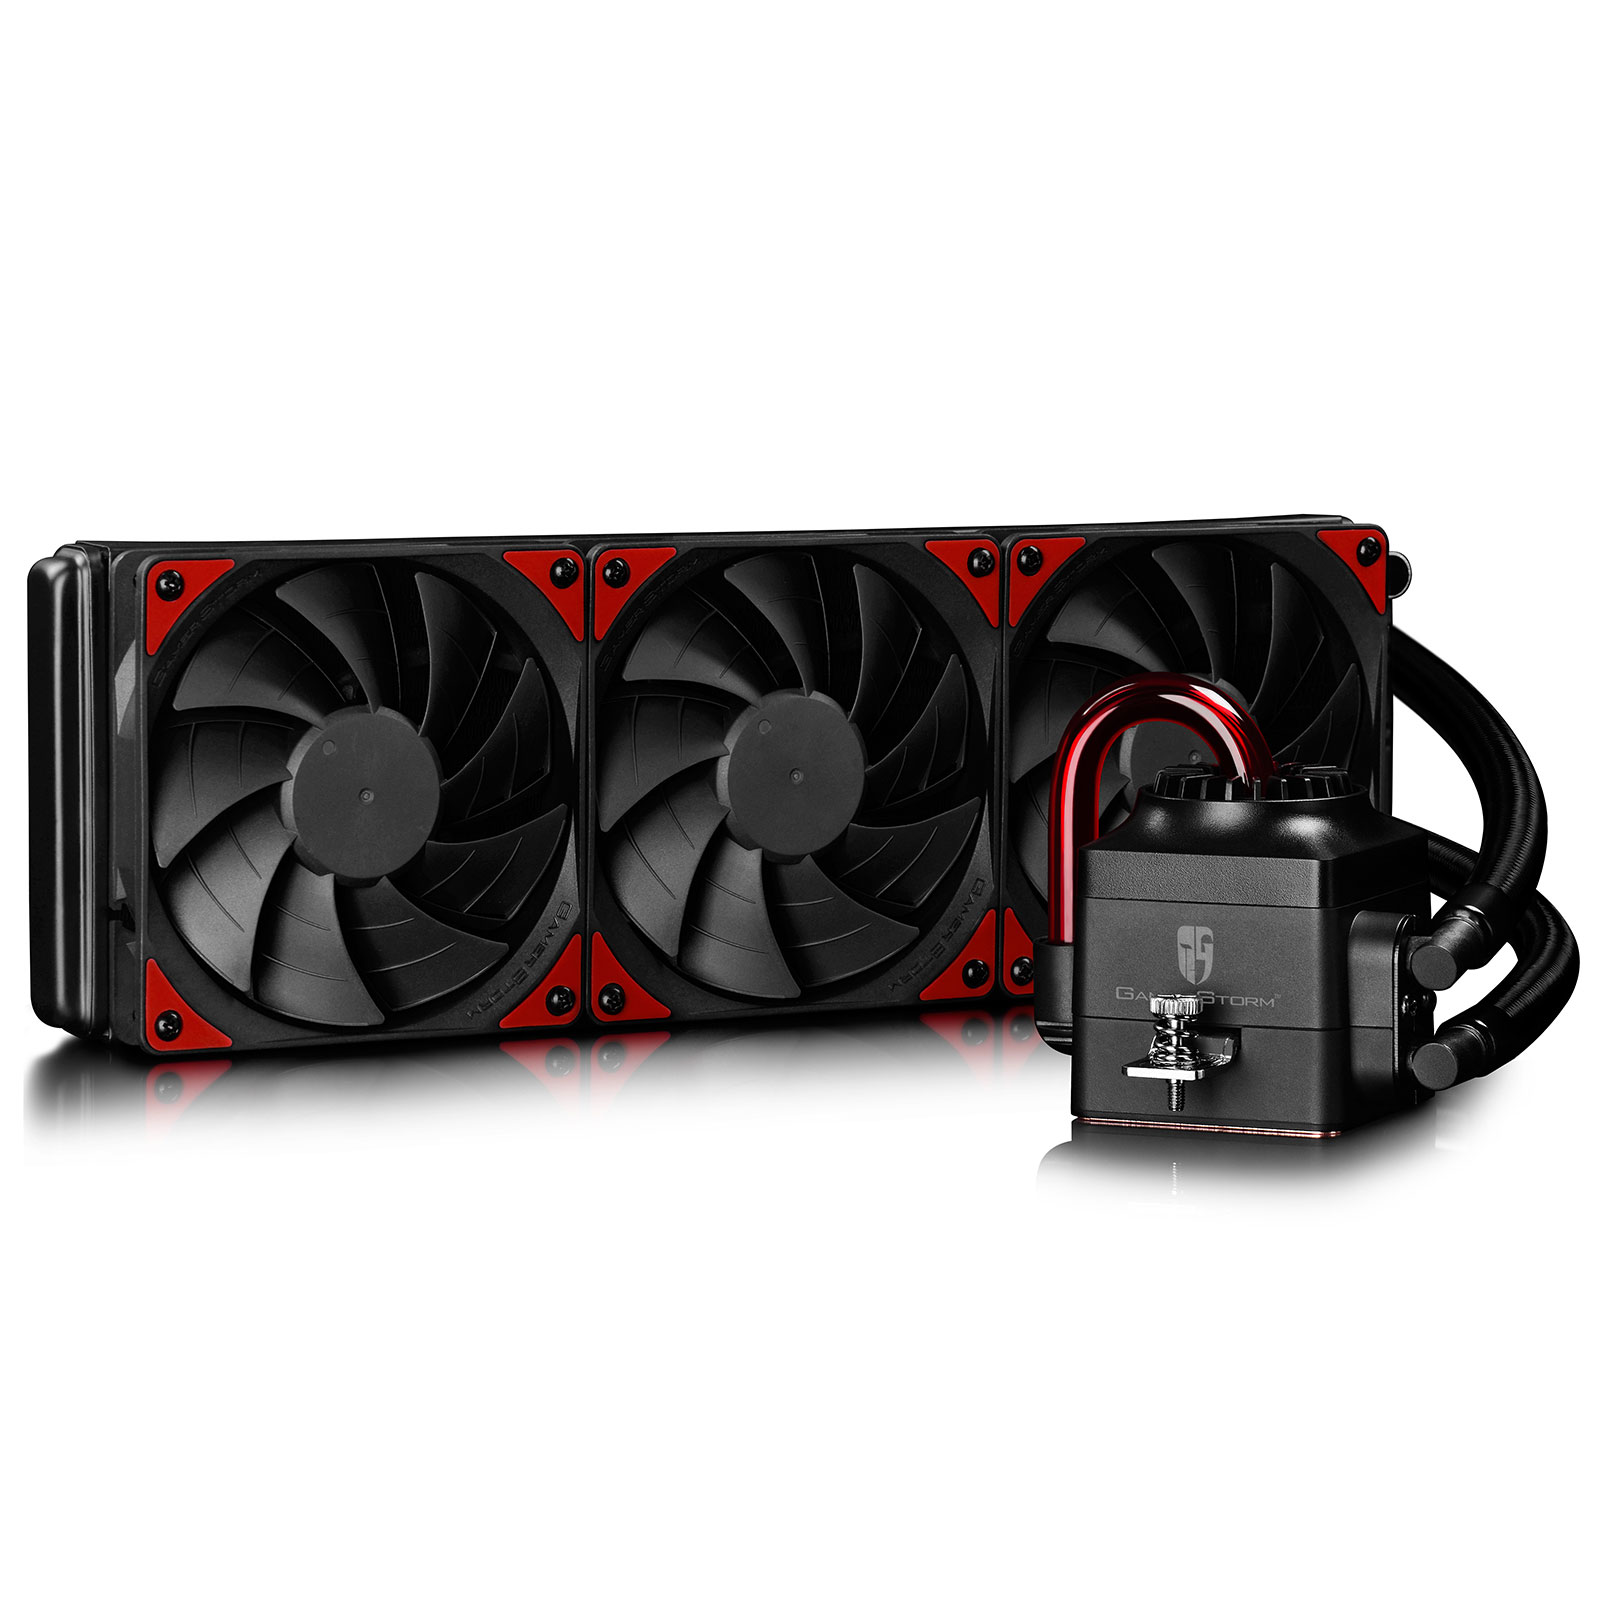 gamer storm captain 360ex noir rouge ventilateur processeur gamer storm sur. Black Bedroom Furniture Sets. Home Design Ideas